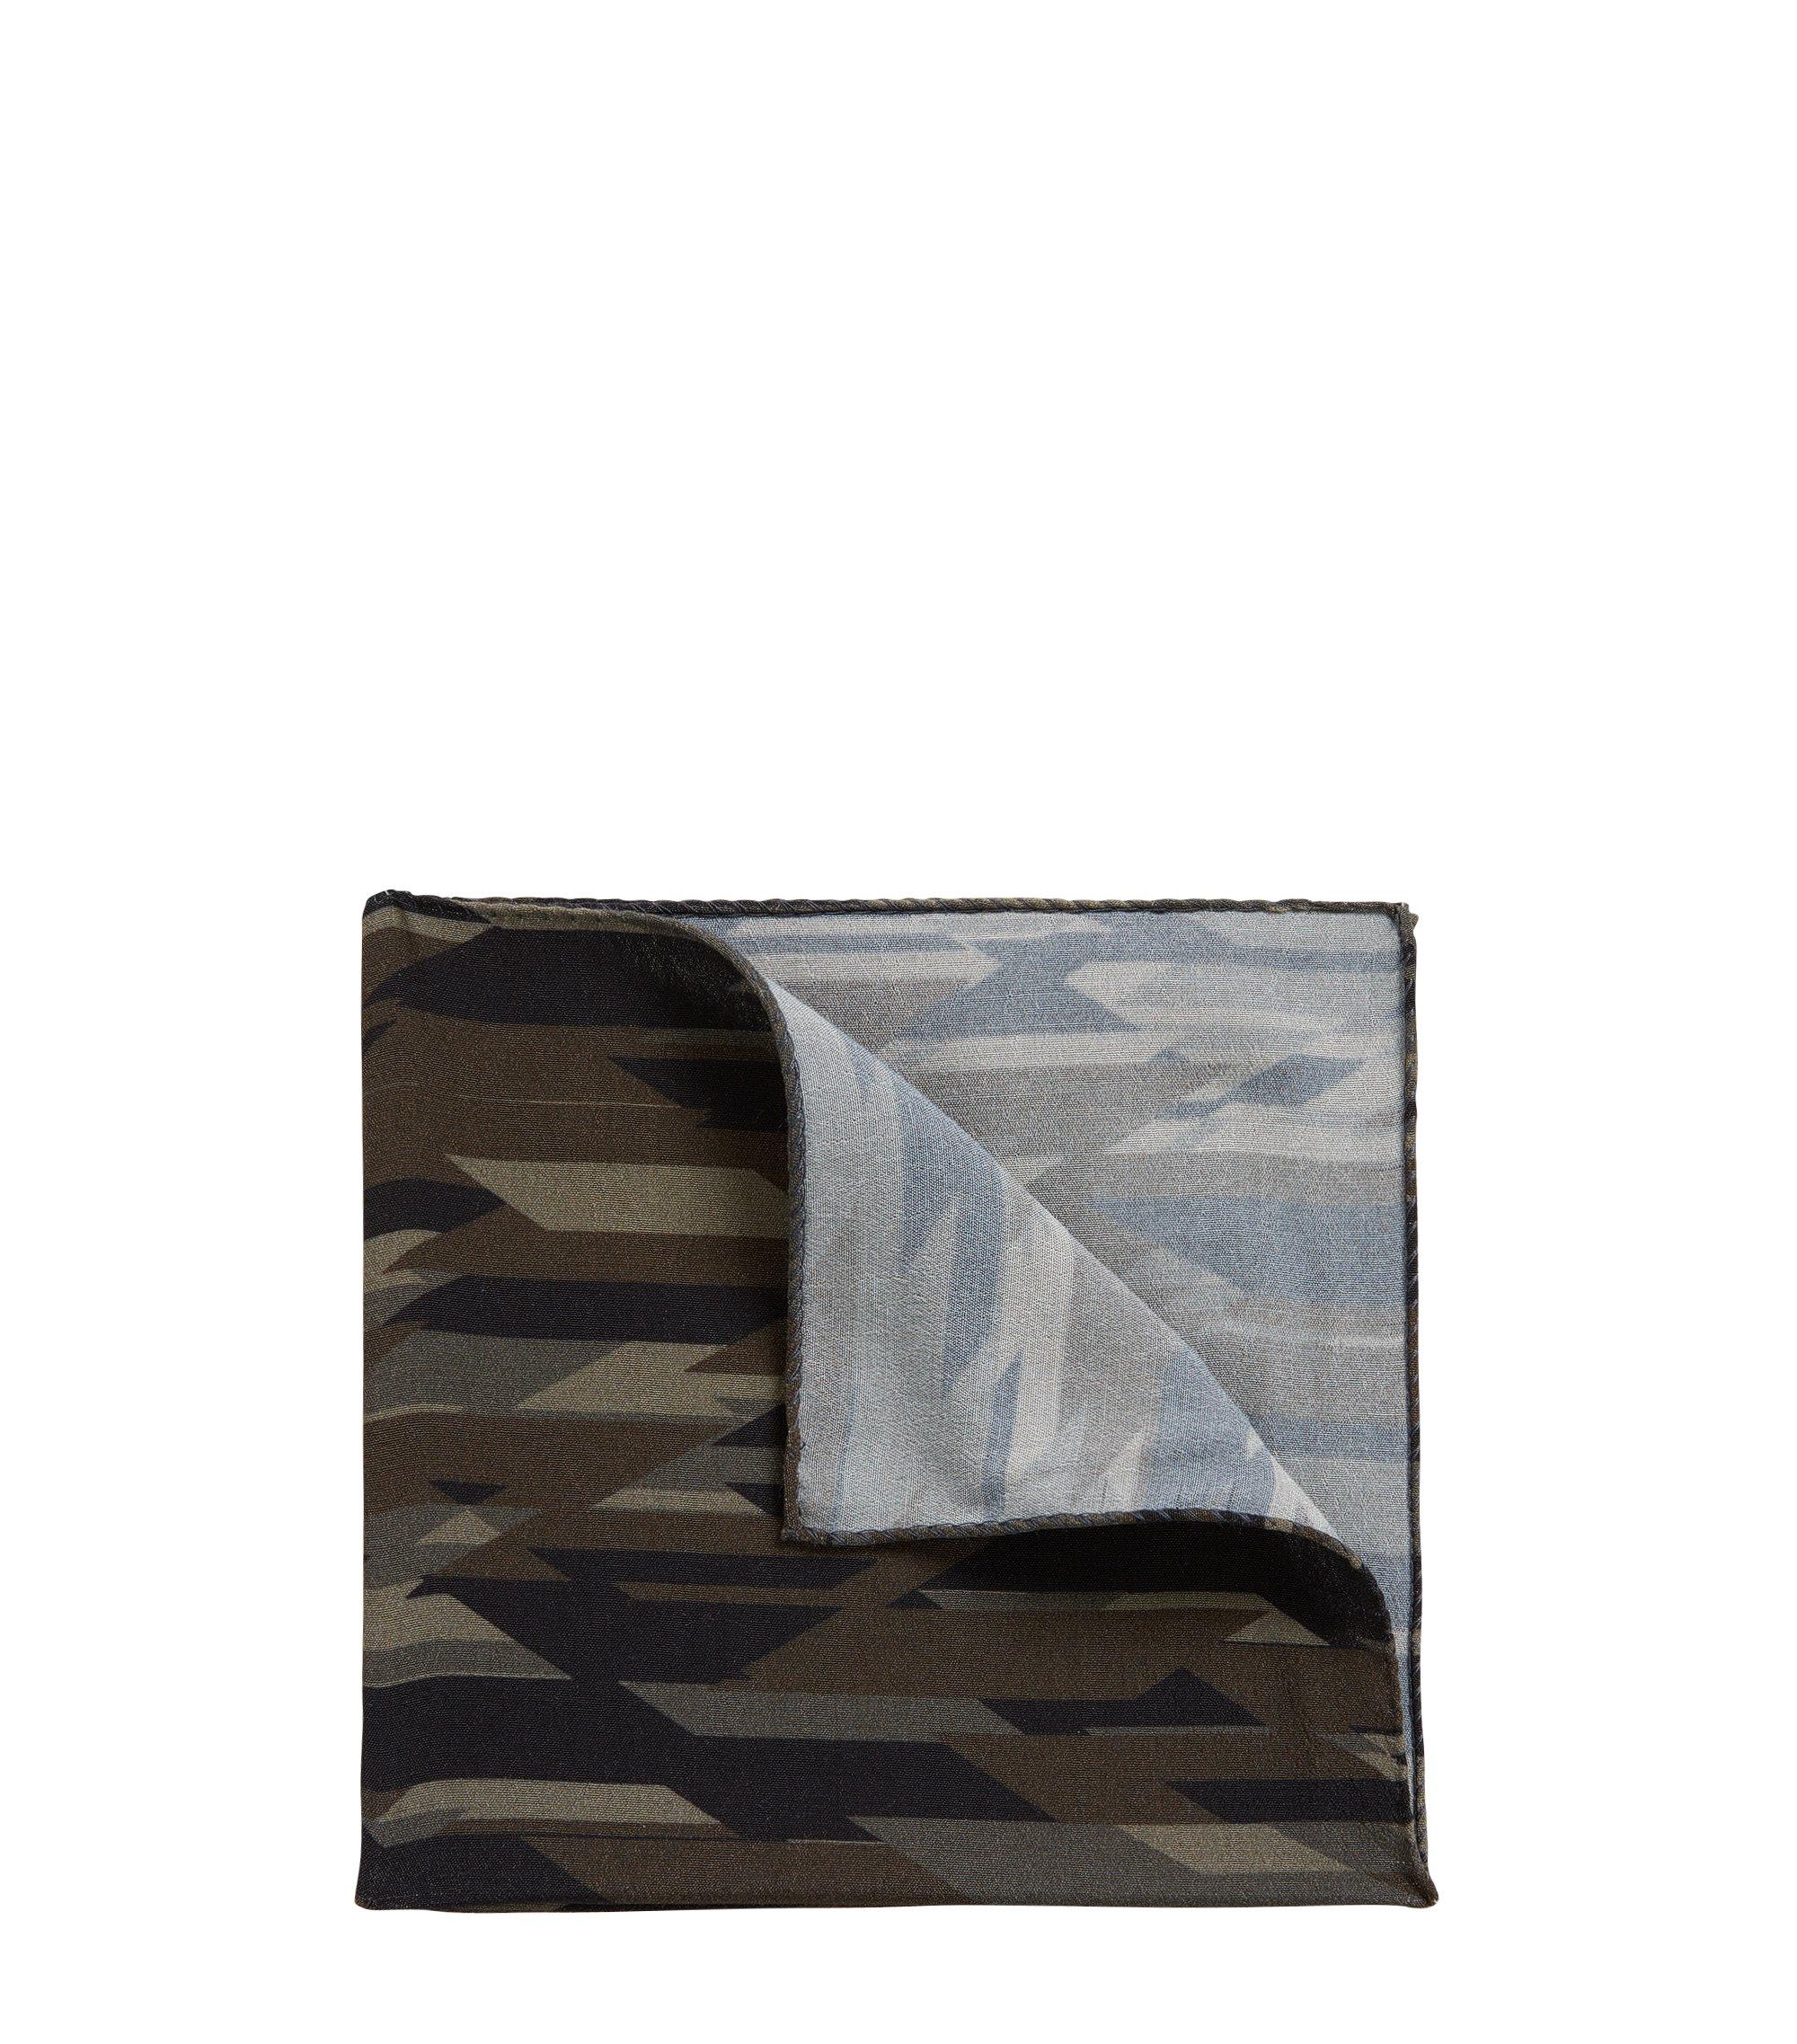 Pochet met camouflageprint, Donkergroen